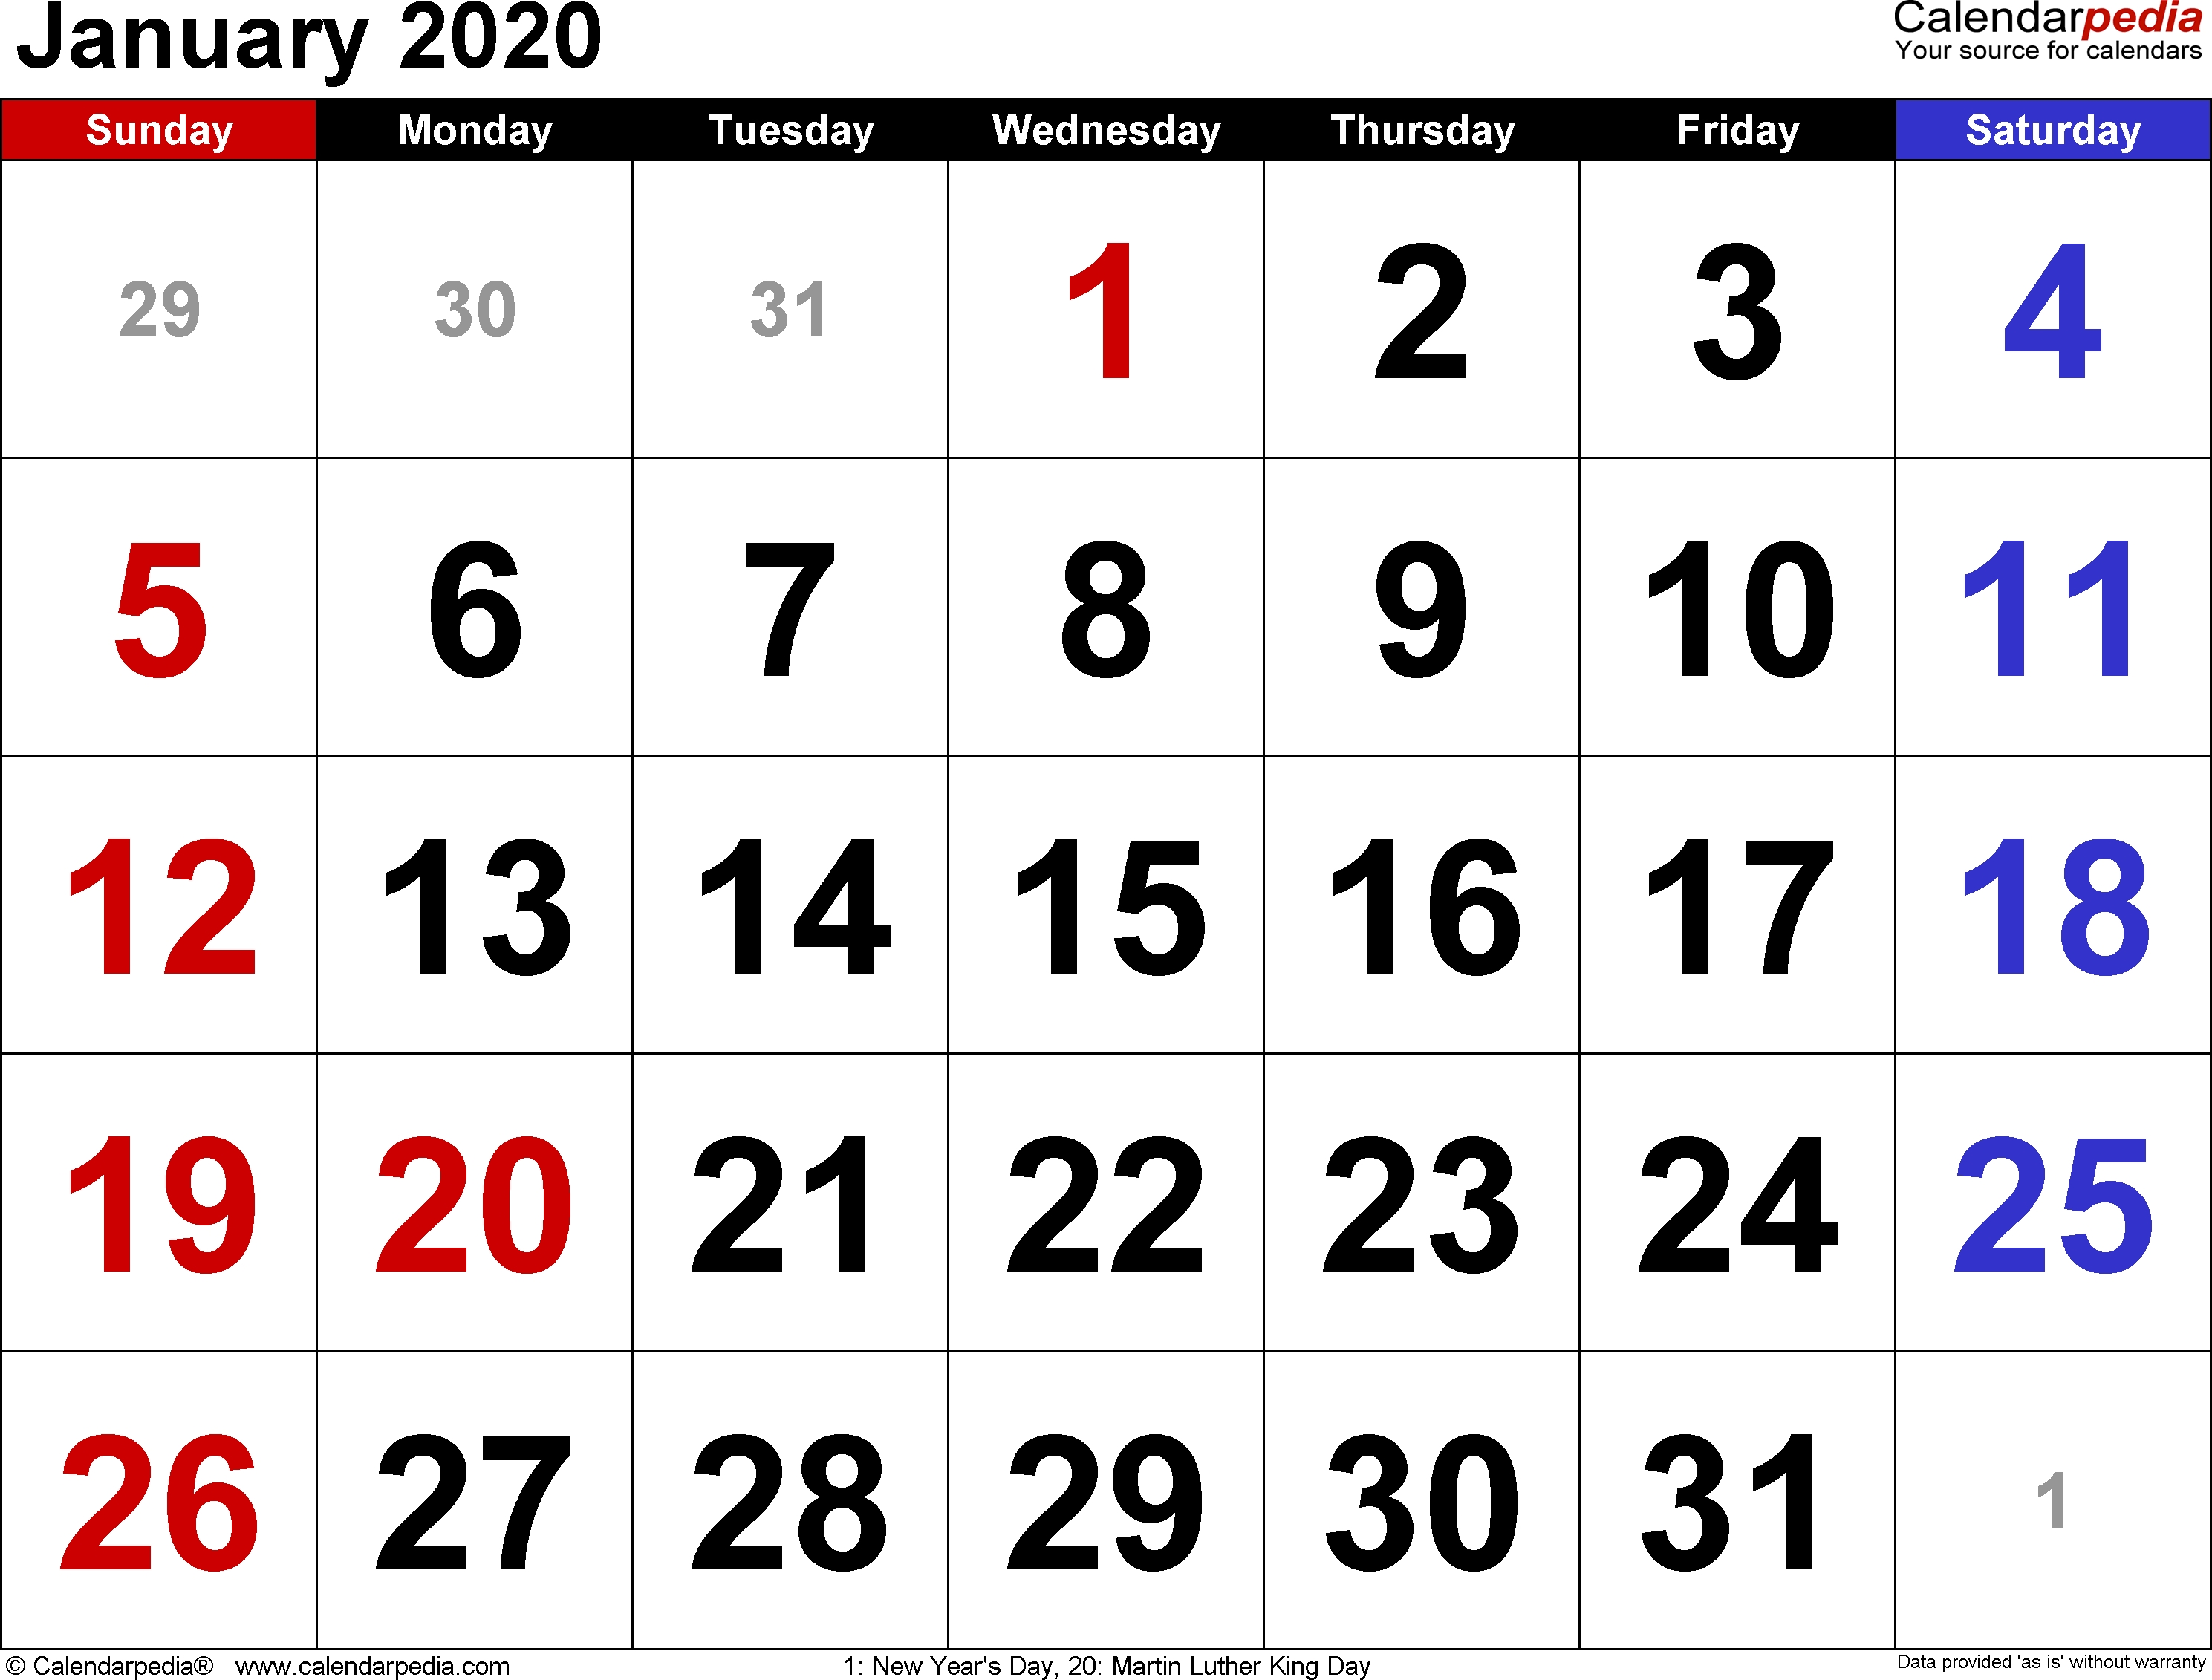 January 2020 Calendars For Word, Excel & Pdf-January 2020 Calendar Monday Start